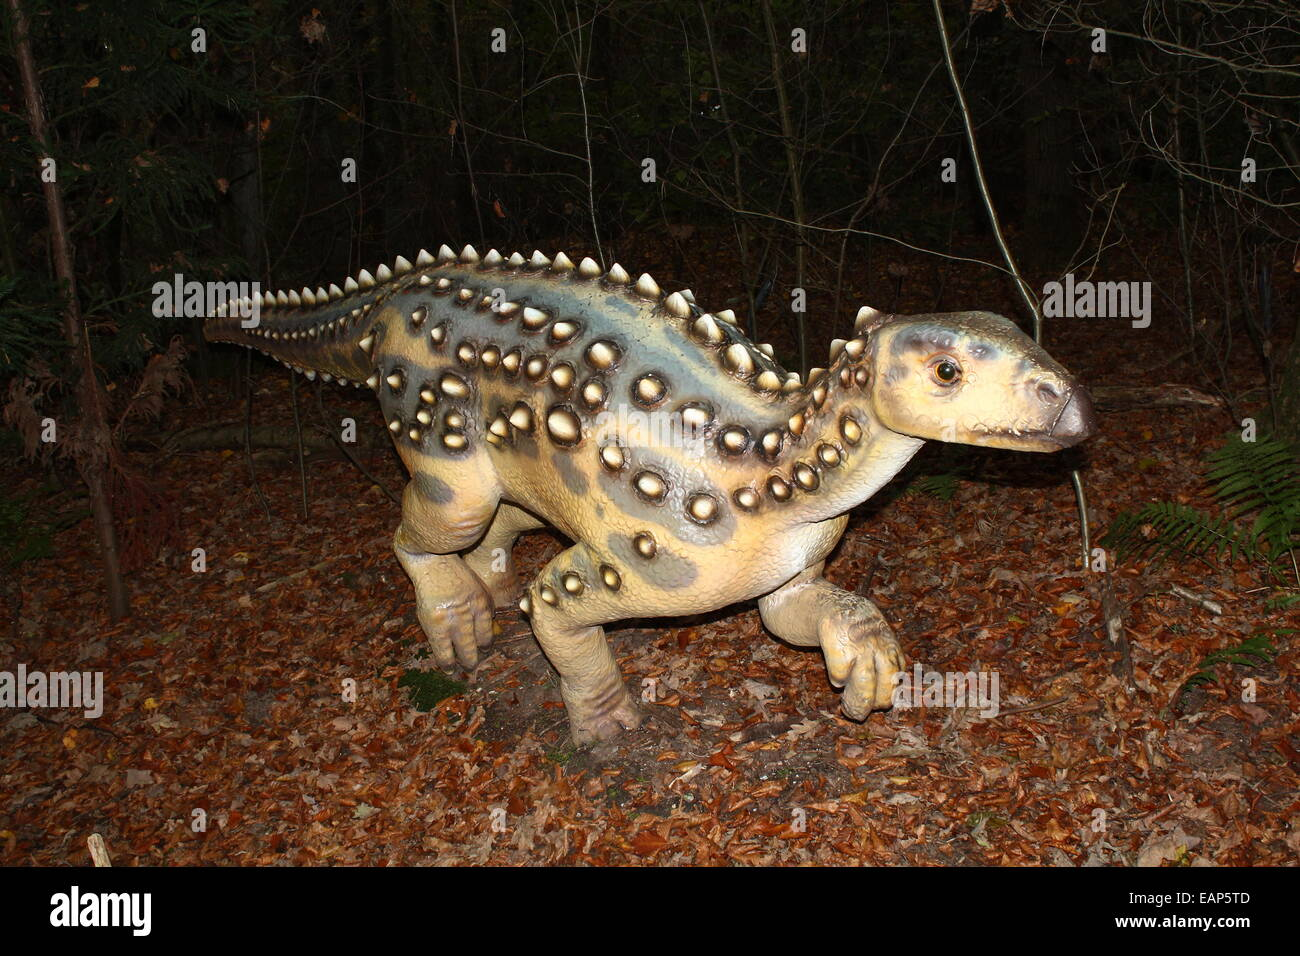 Model of a Jurassic era  Scelidodaurus.  Full-size and lifelike dino statue at  Dinopark Amersfoort Zoo, The Netherlands Stock Photo